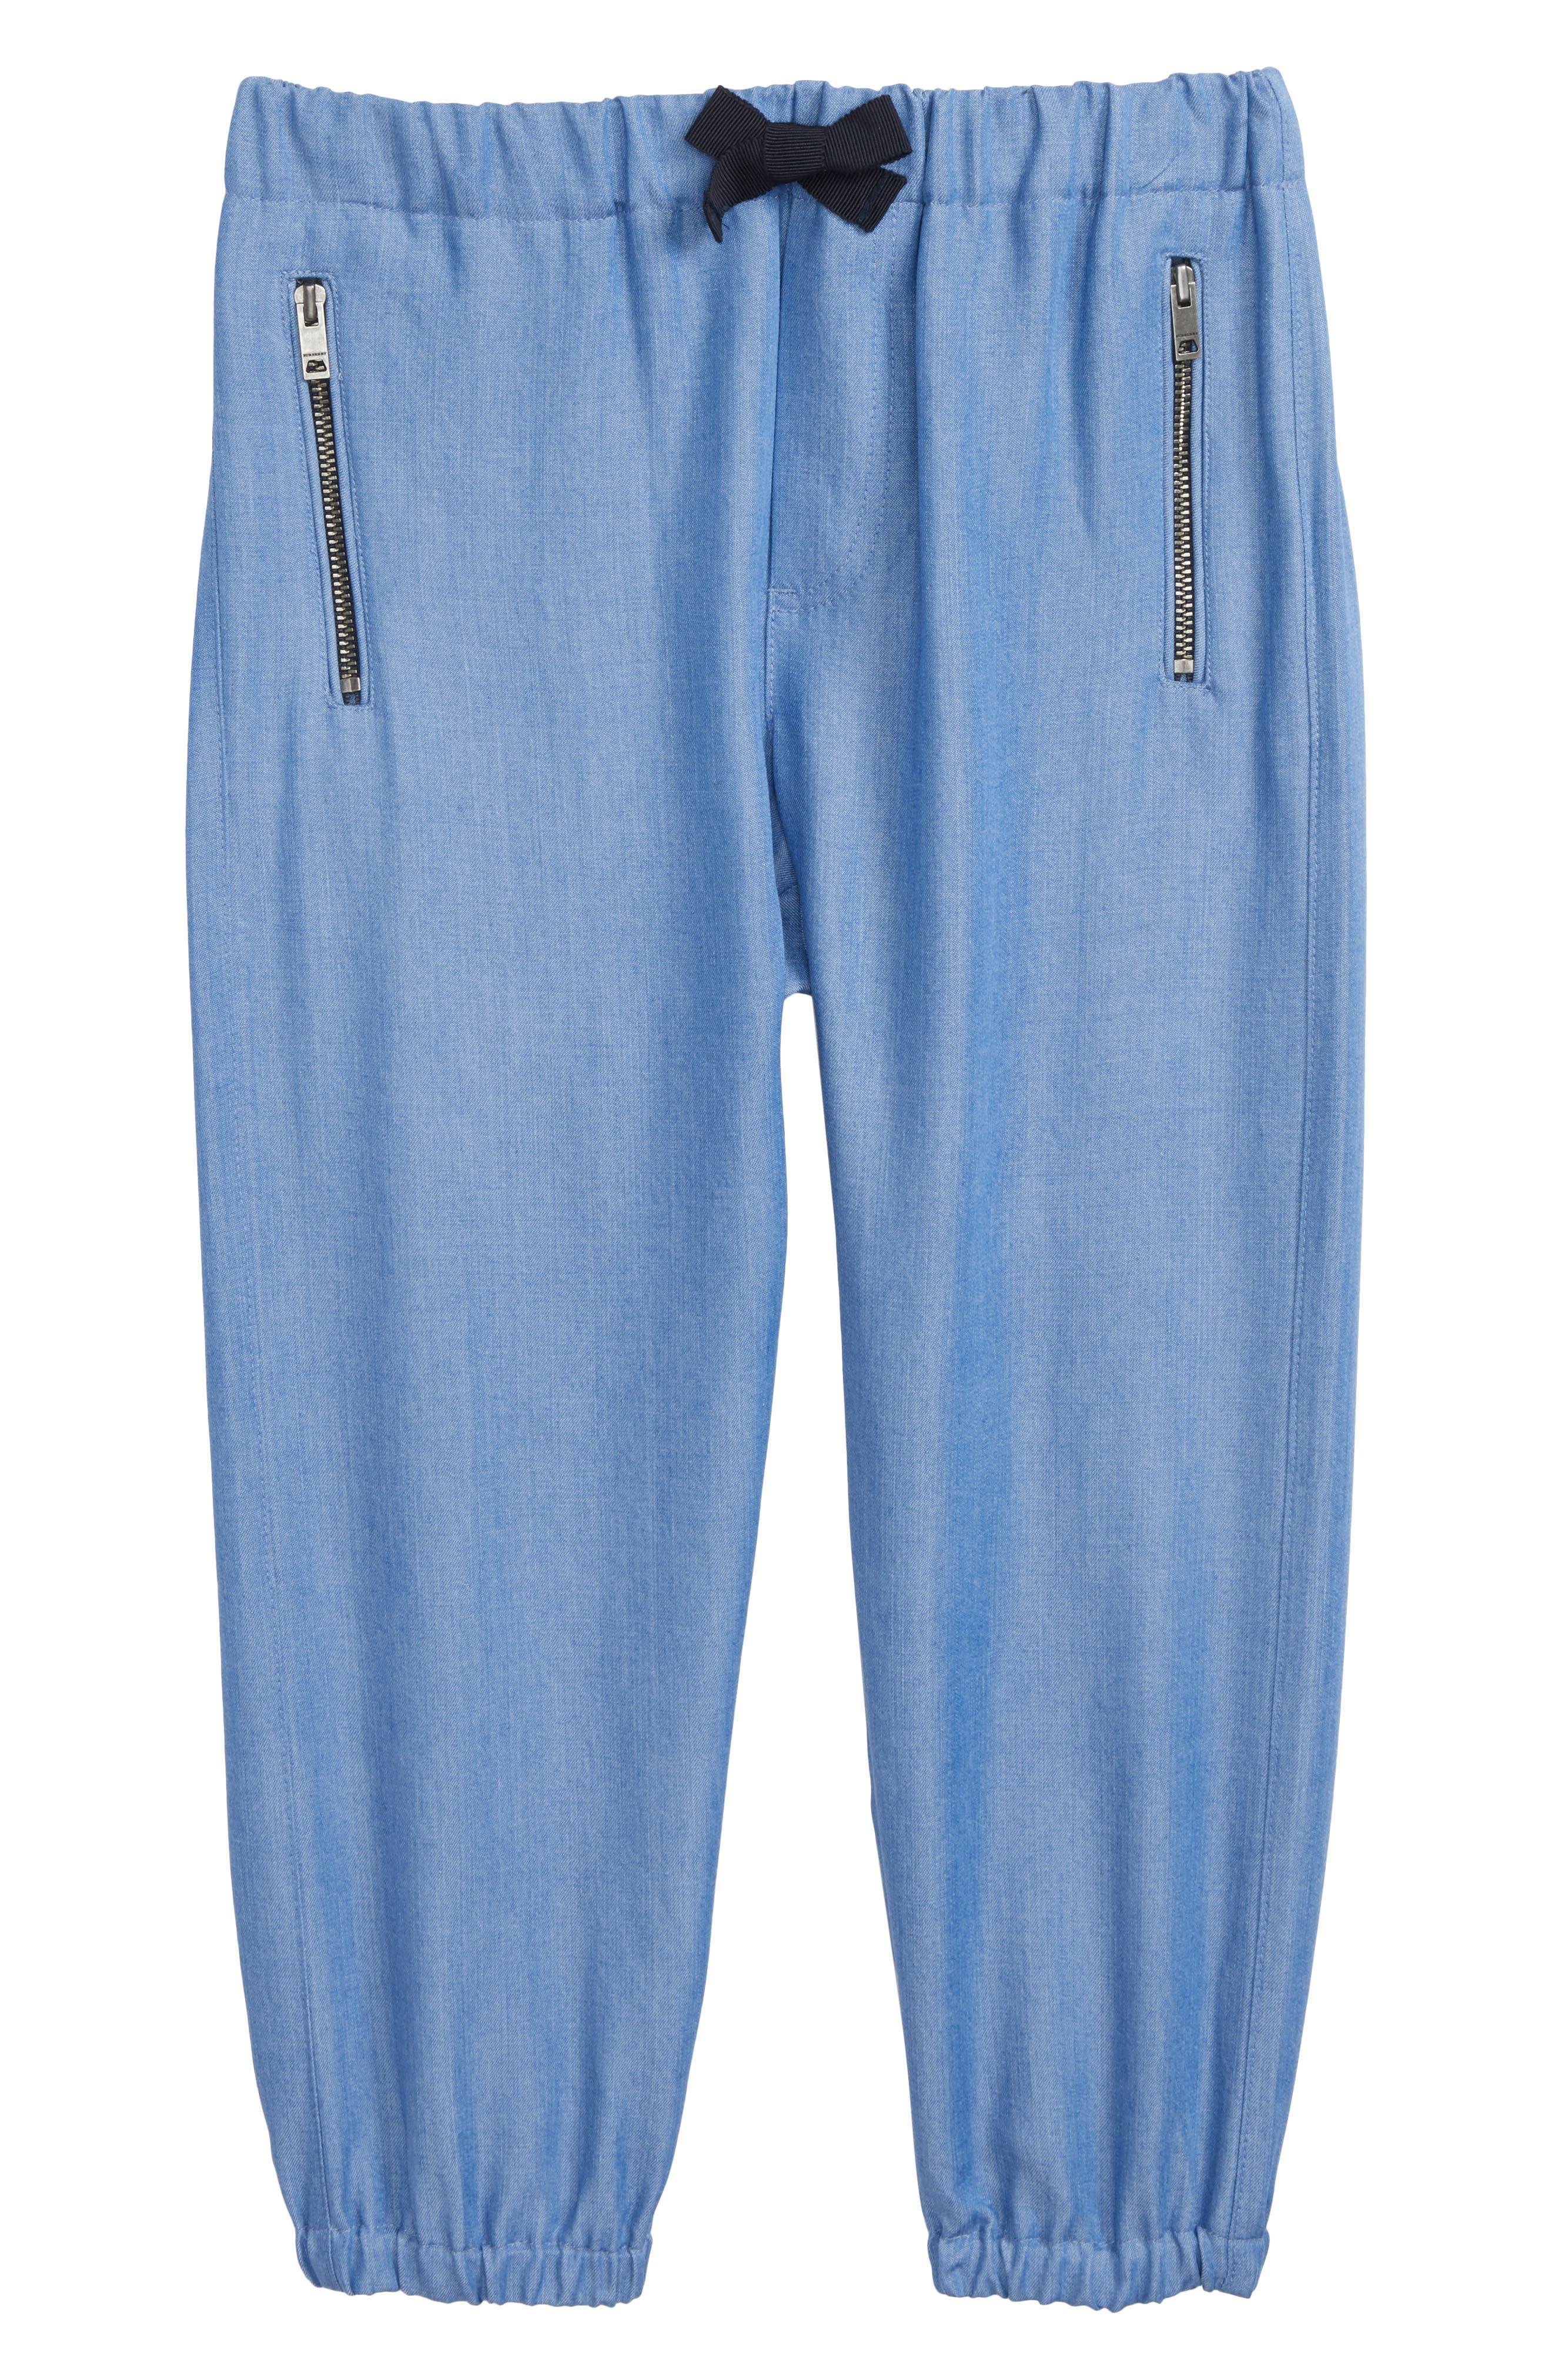 Phillie Chambray Pants,                             Main thumbnail 1, color,                             Steel Blue